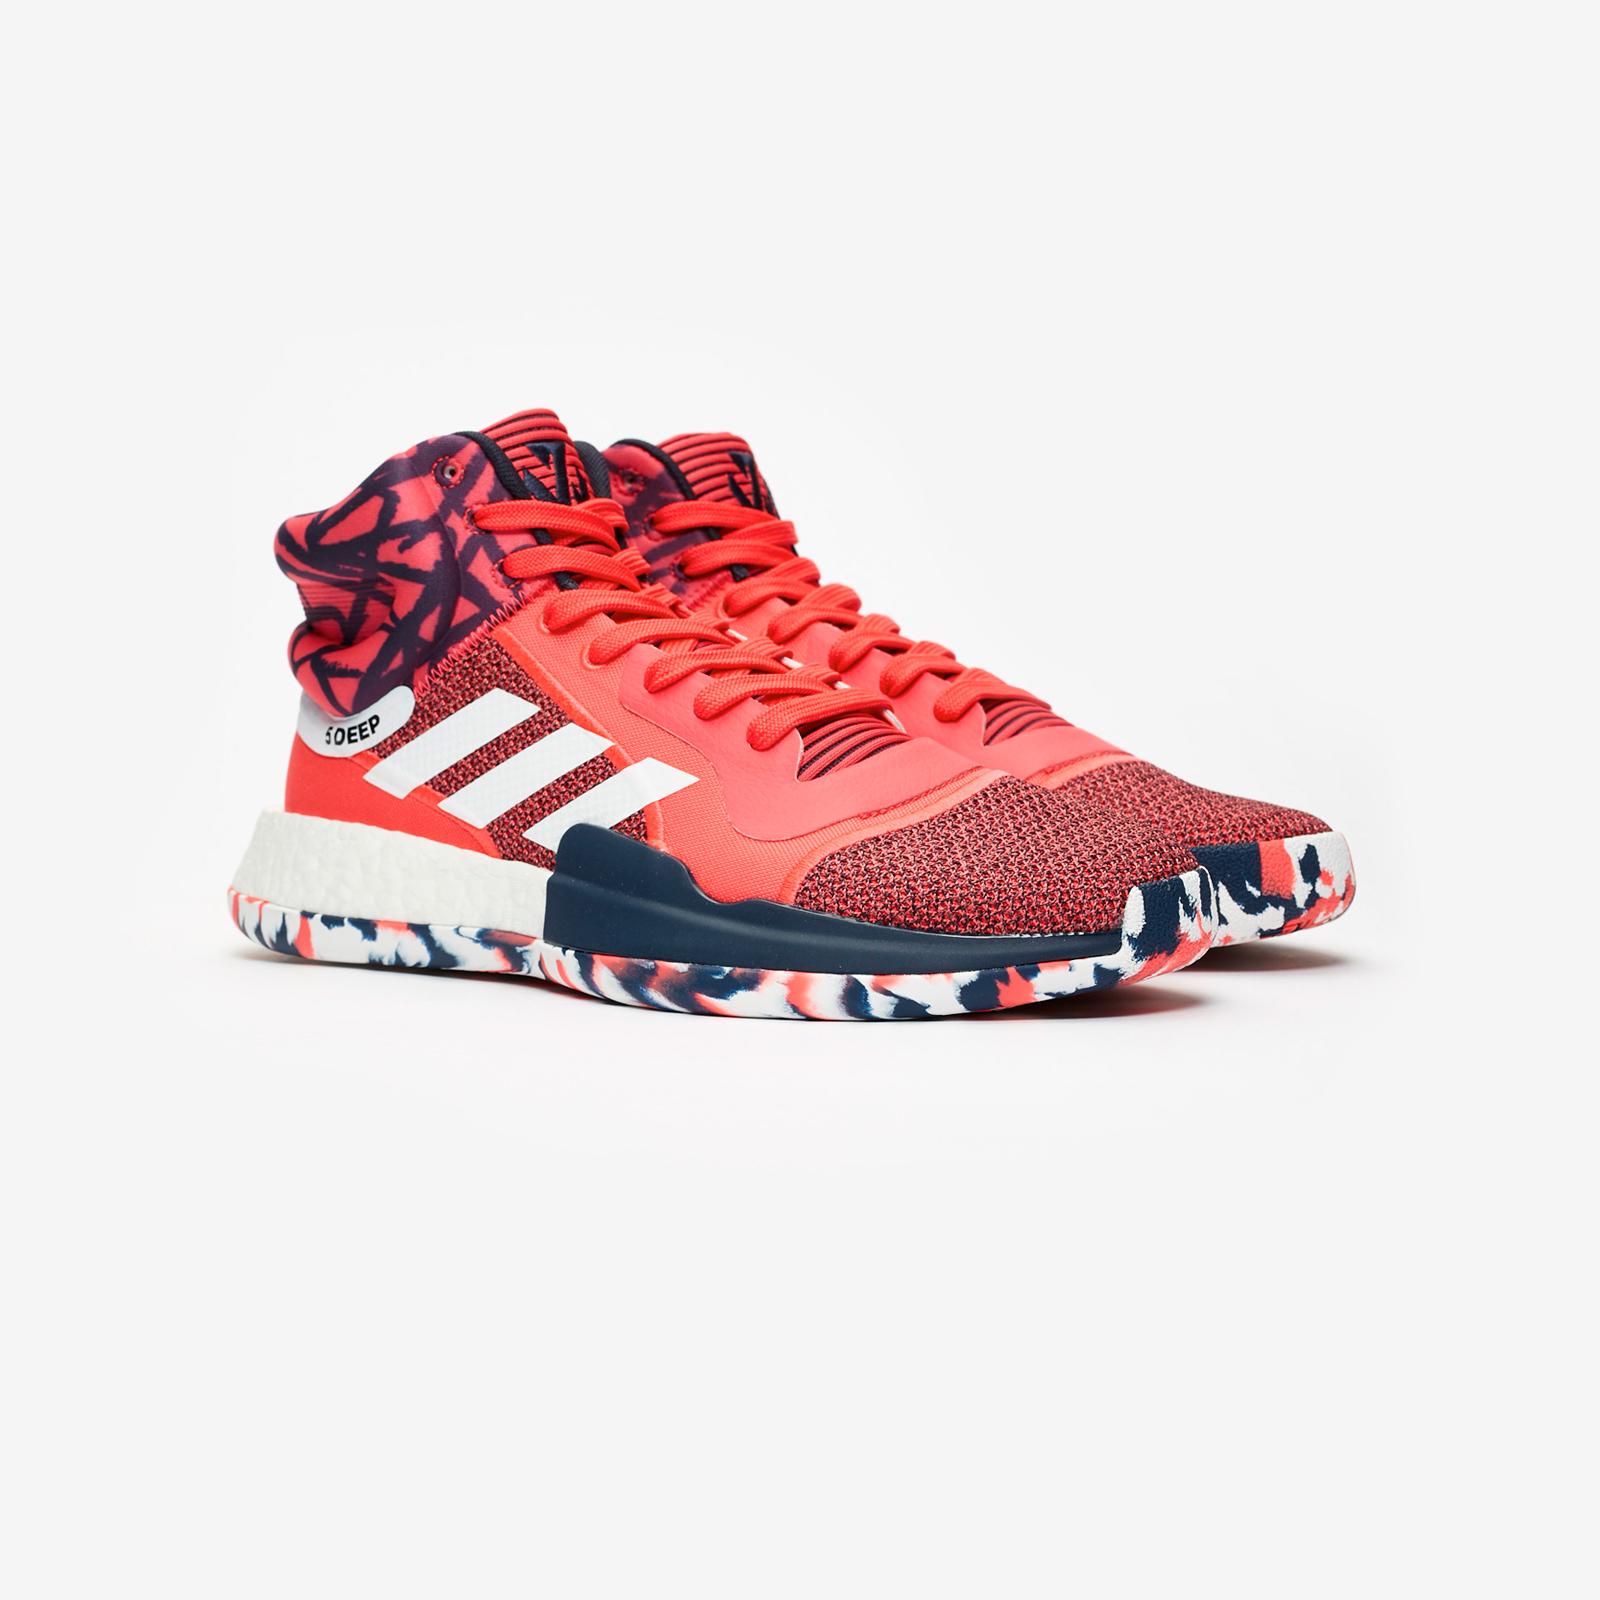 91172cf8f5f adidas Marquee Boost - G27737 - Sneakersnstuff